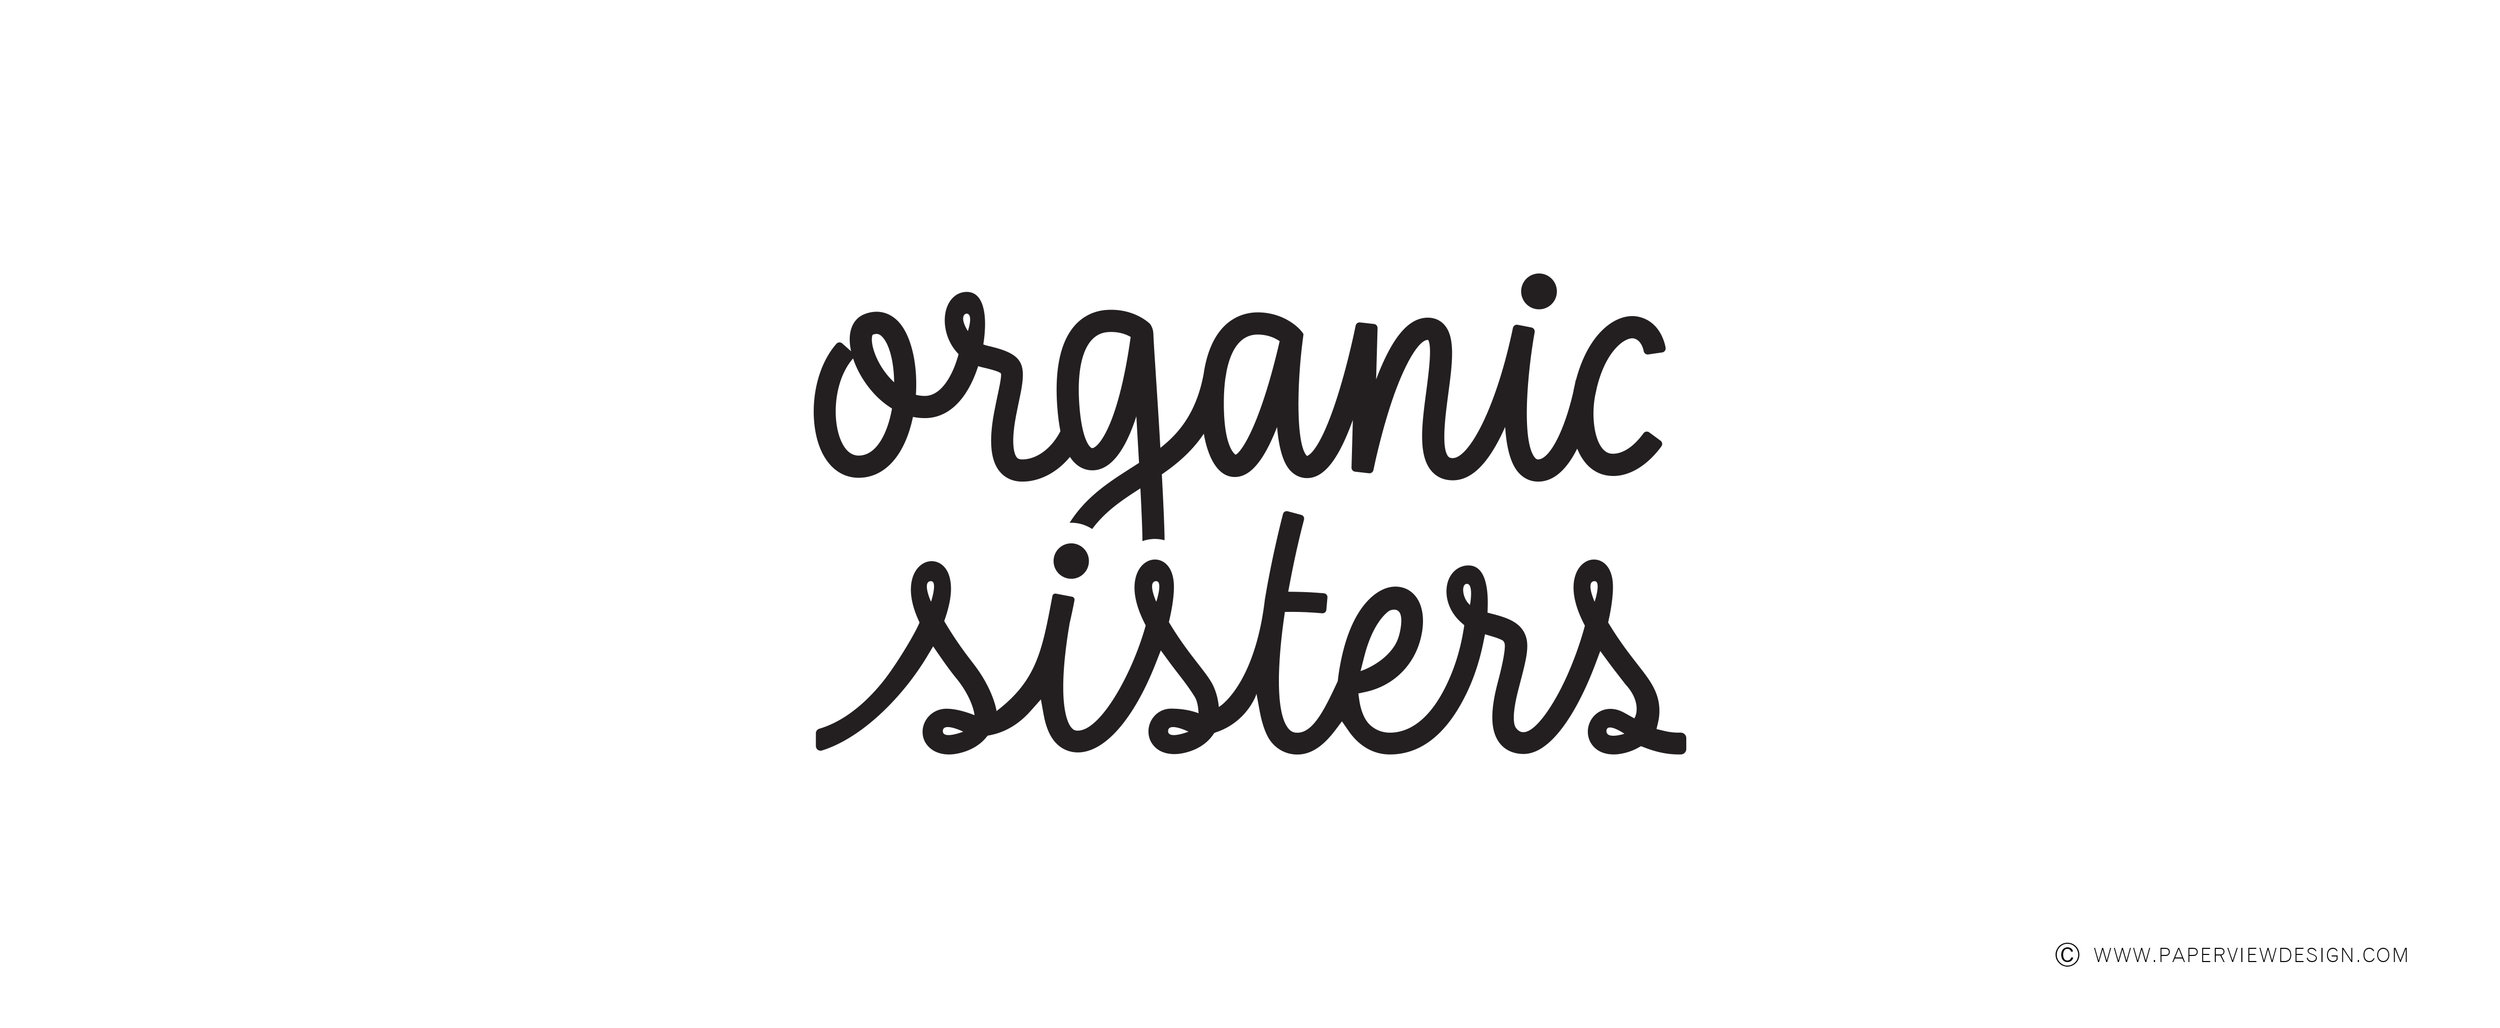 OrganicSisters-logo-website.jpg